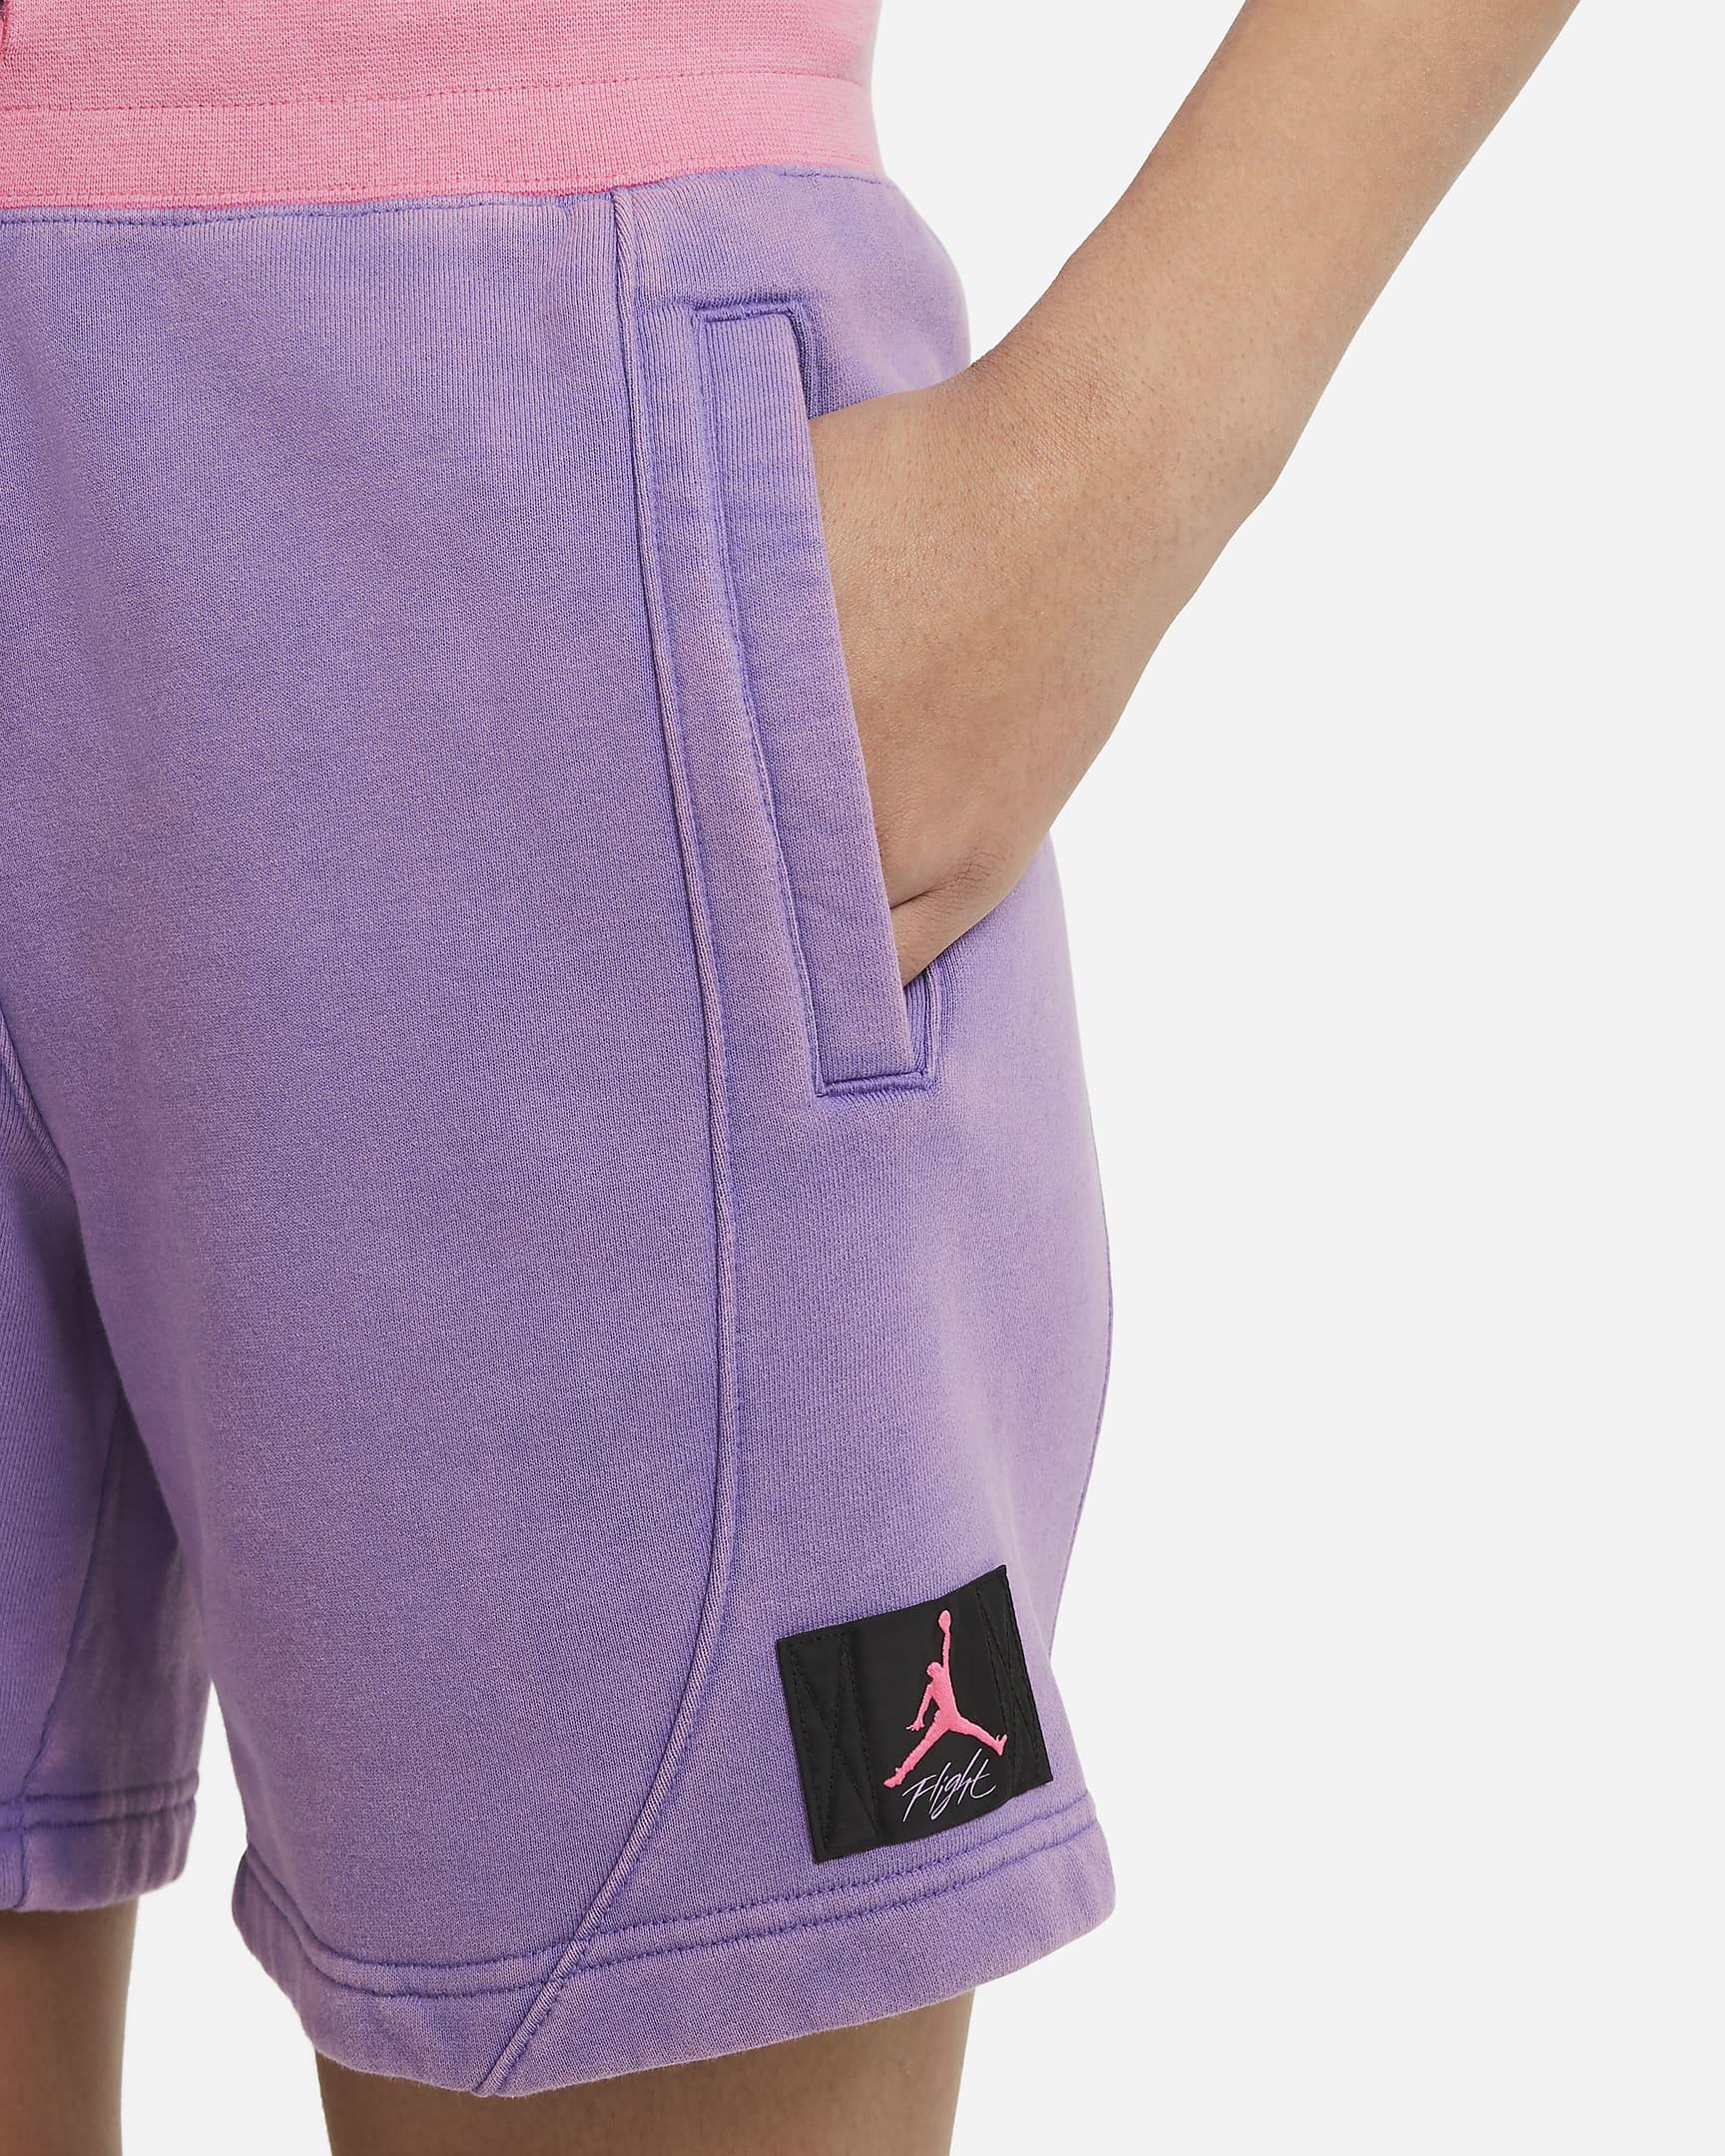 jordan-flight-womens-fleece-shorts-zDGn42-5